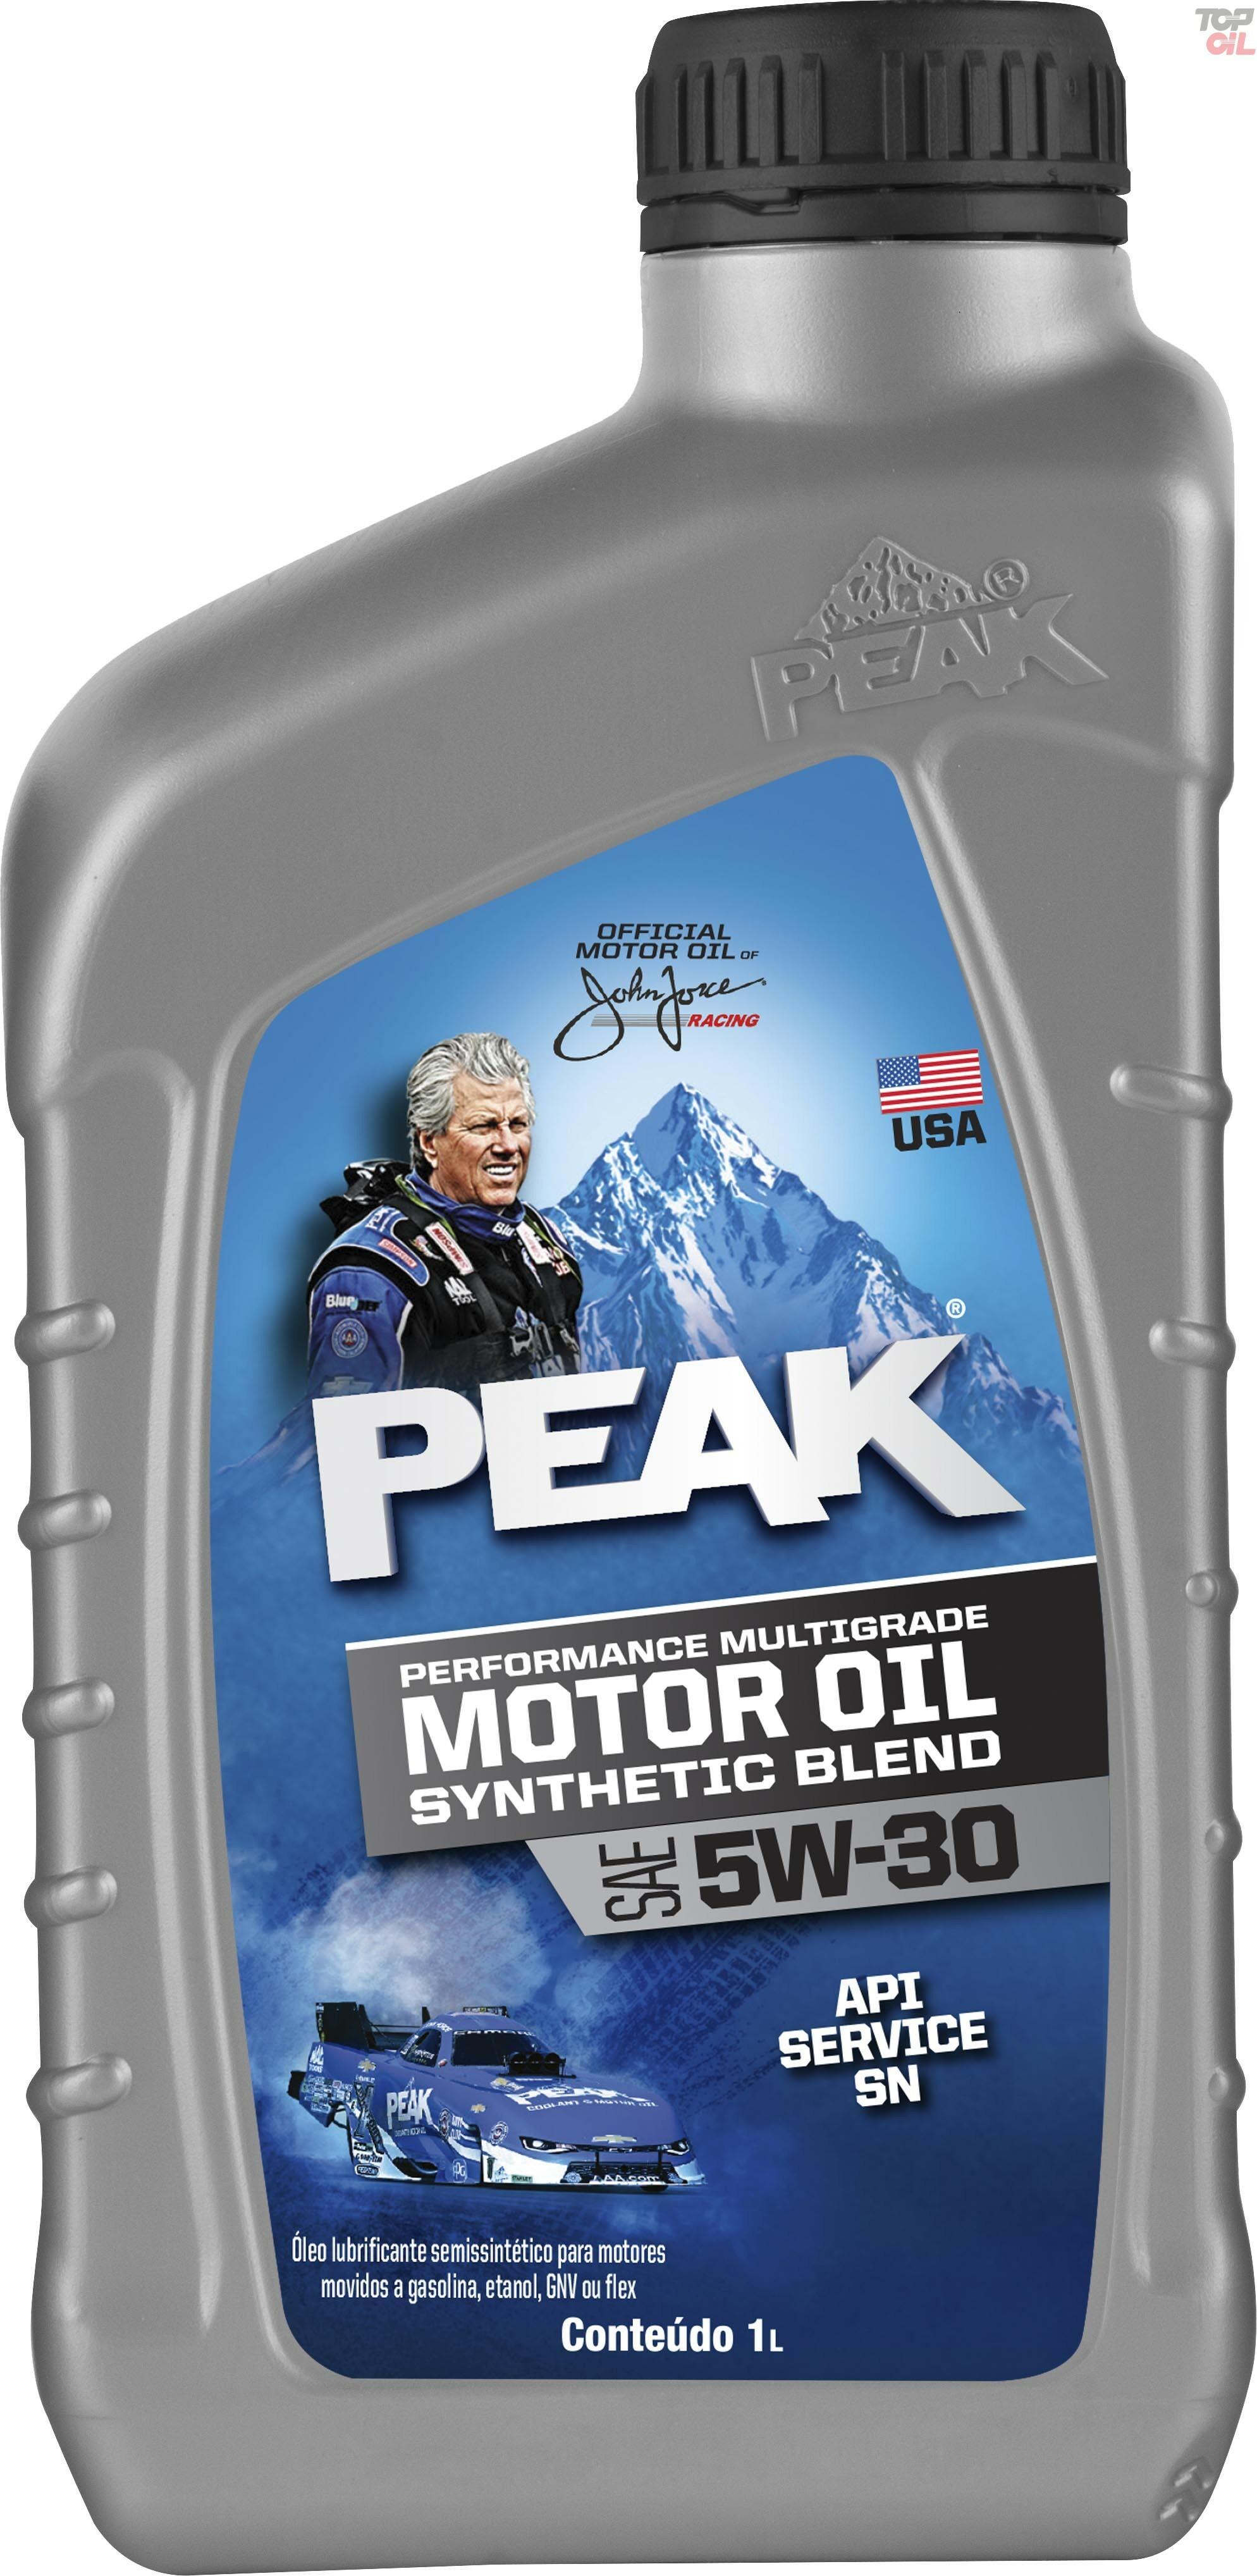 Oleo de motor Peak BLEND 5W30 API SN/GF-5- Sintetico - 946ML